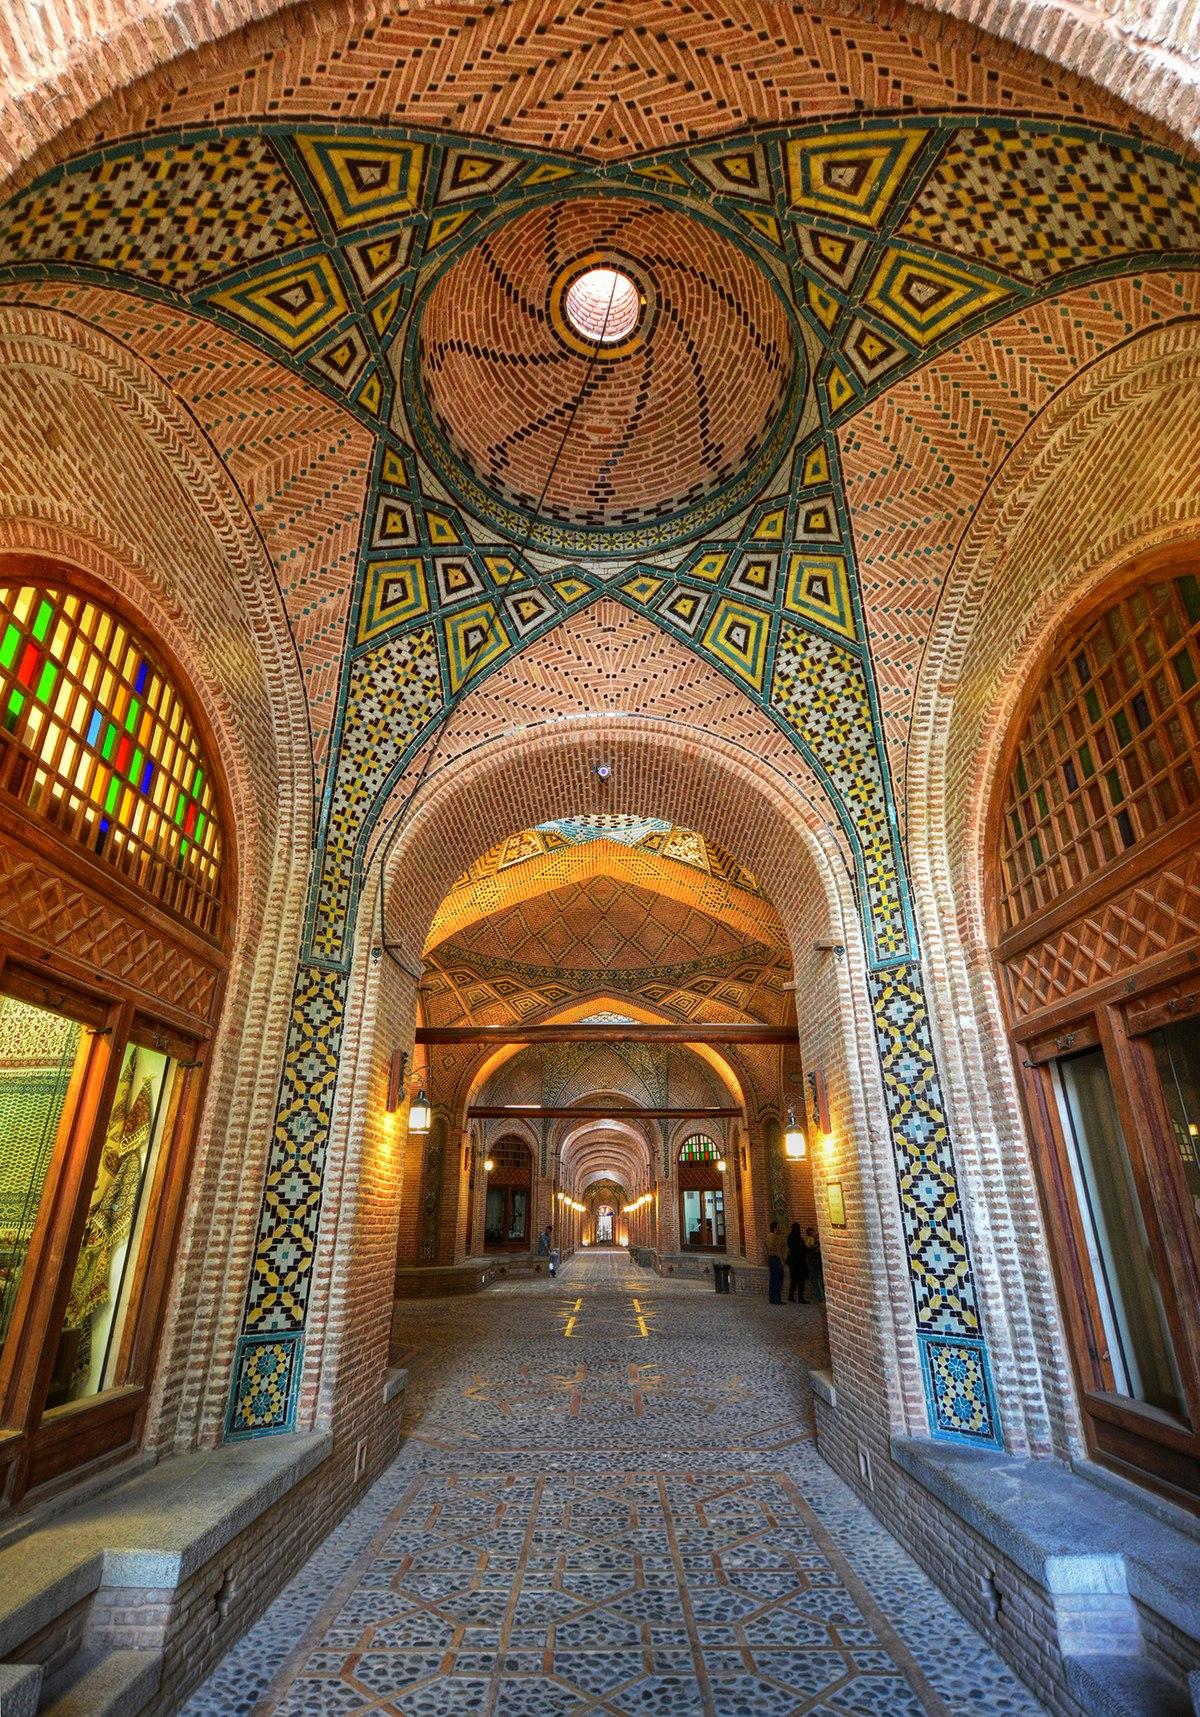 File:Sa'd al-Saltaneh Caravanserai in Qazvin.jpg - Wikimedia Commons